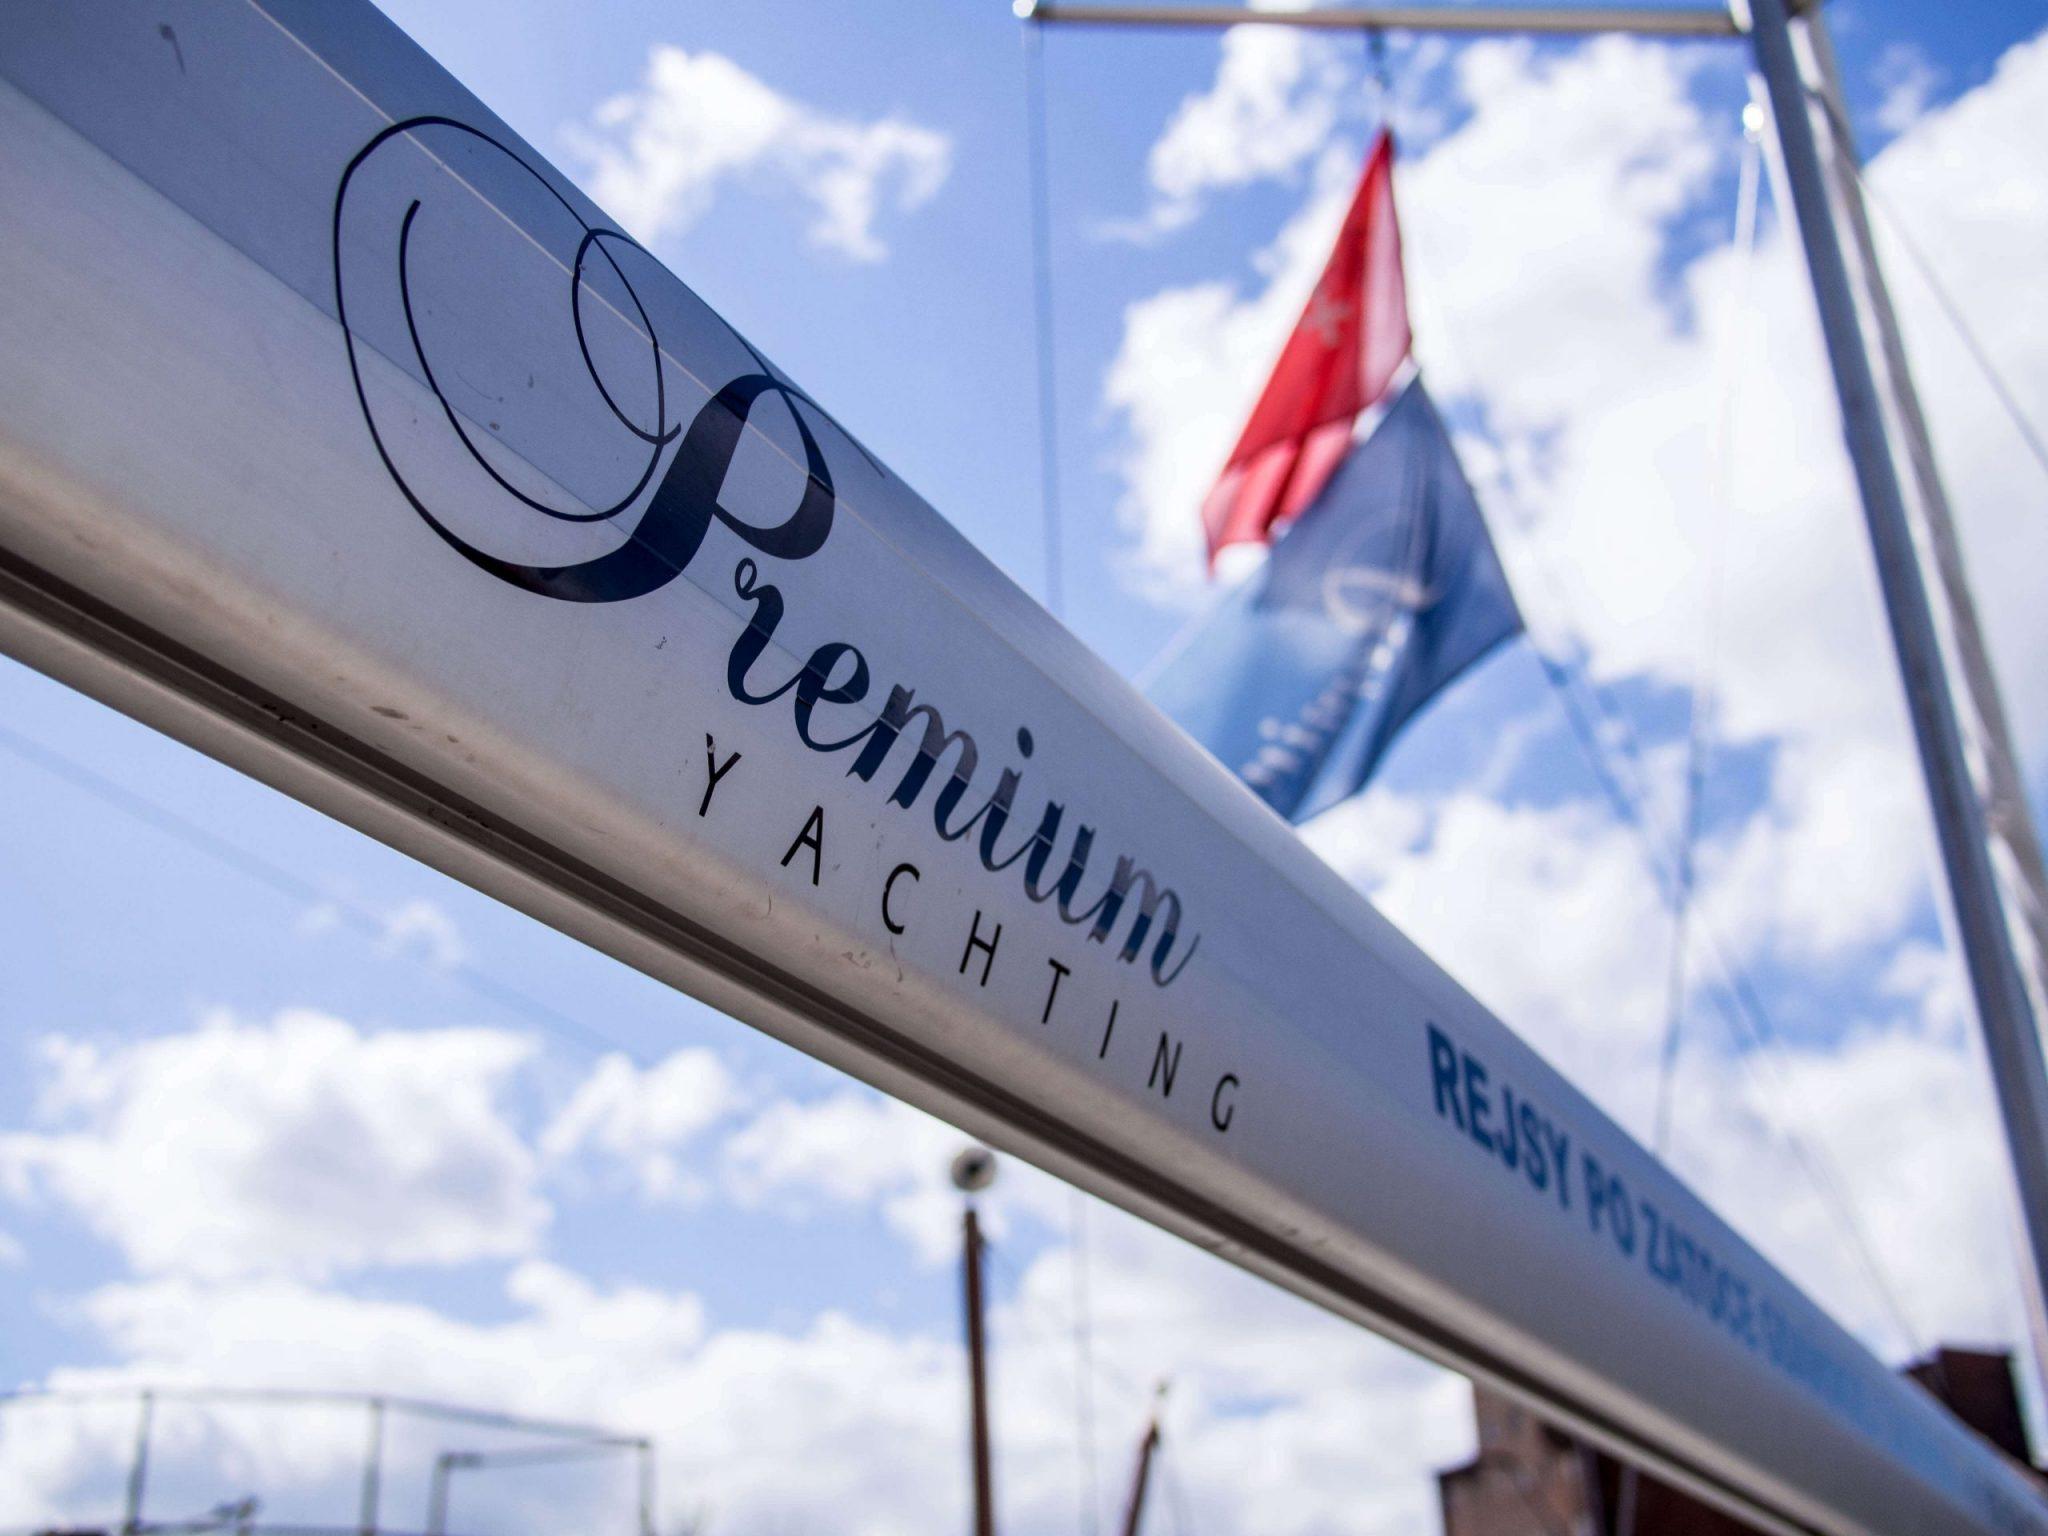 Wodne atrakcje - Premium Jachting